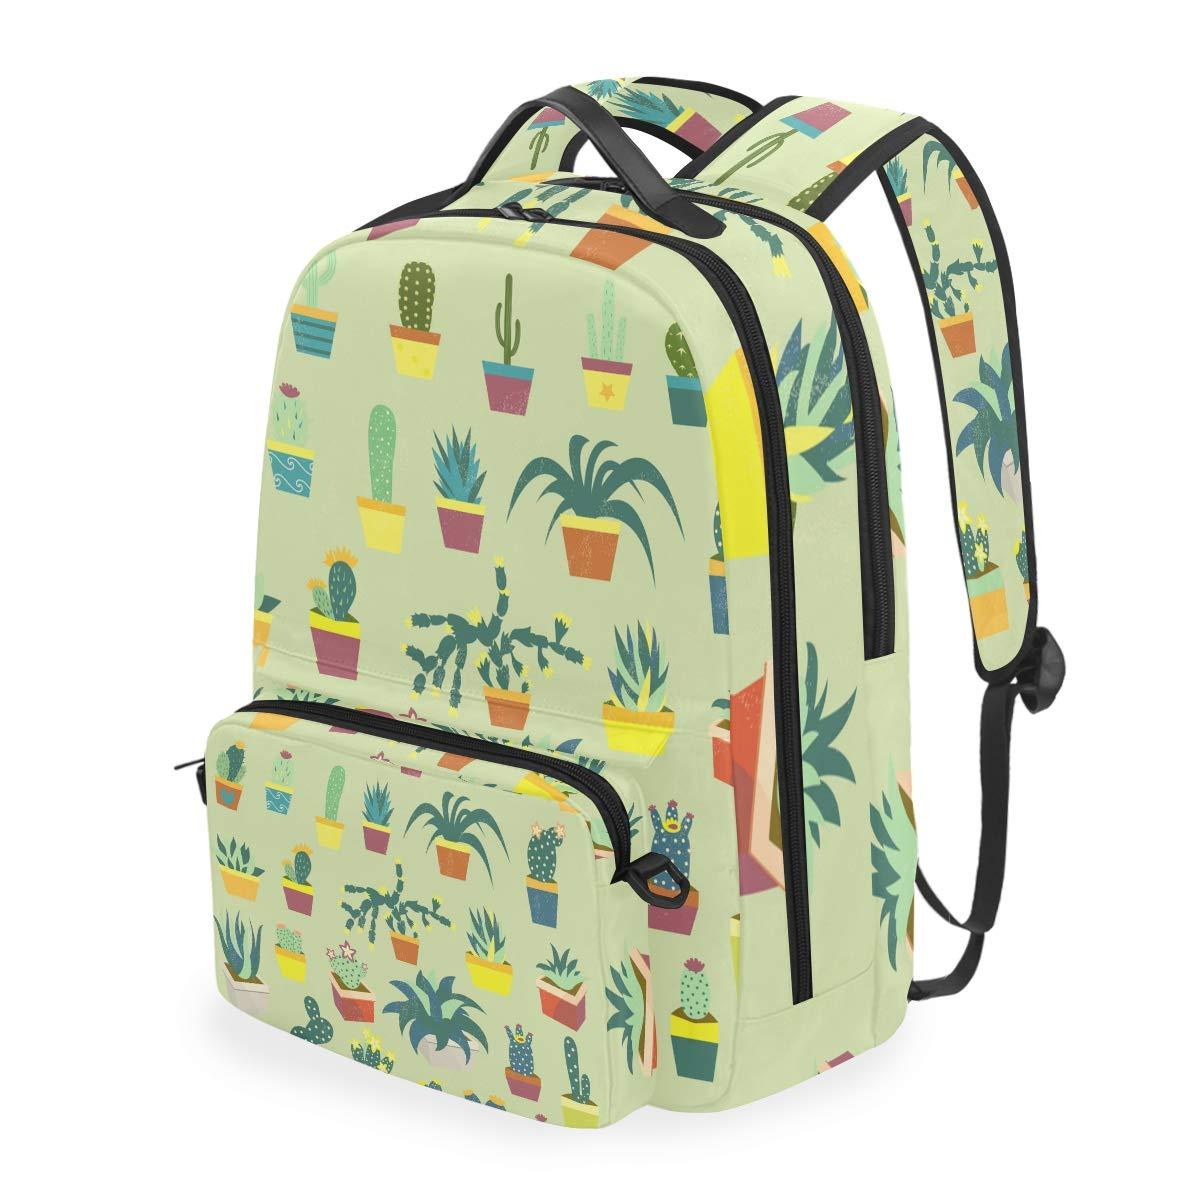 Green Cactus Cacti Shoulder Backpack Messenger Crossbody Laptop Bag Student Bookbags for Kid Girls Boys